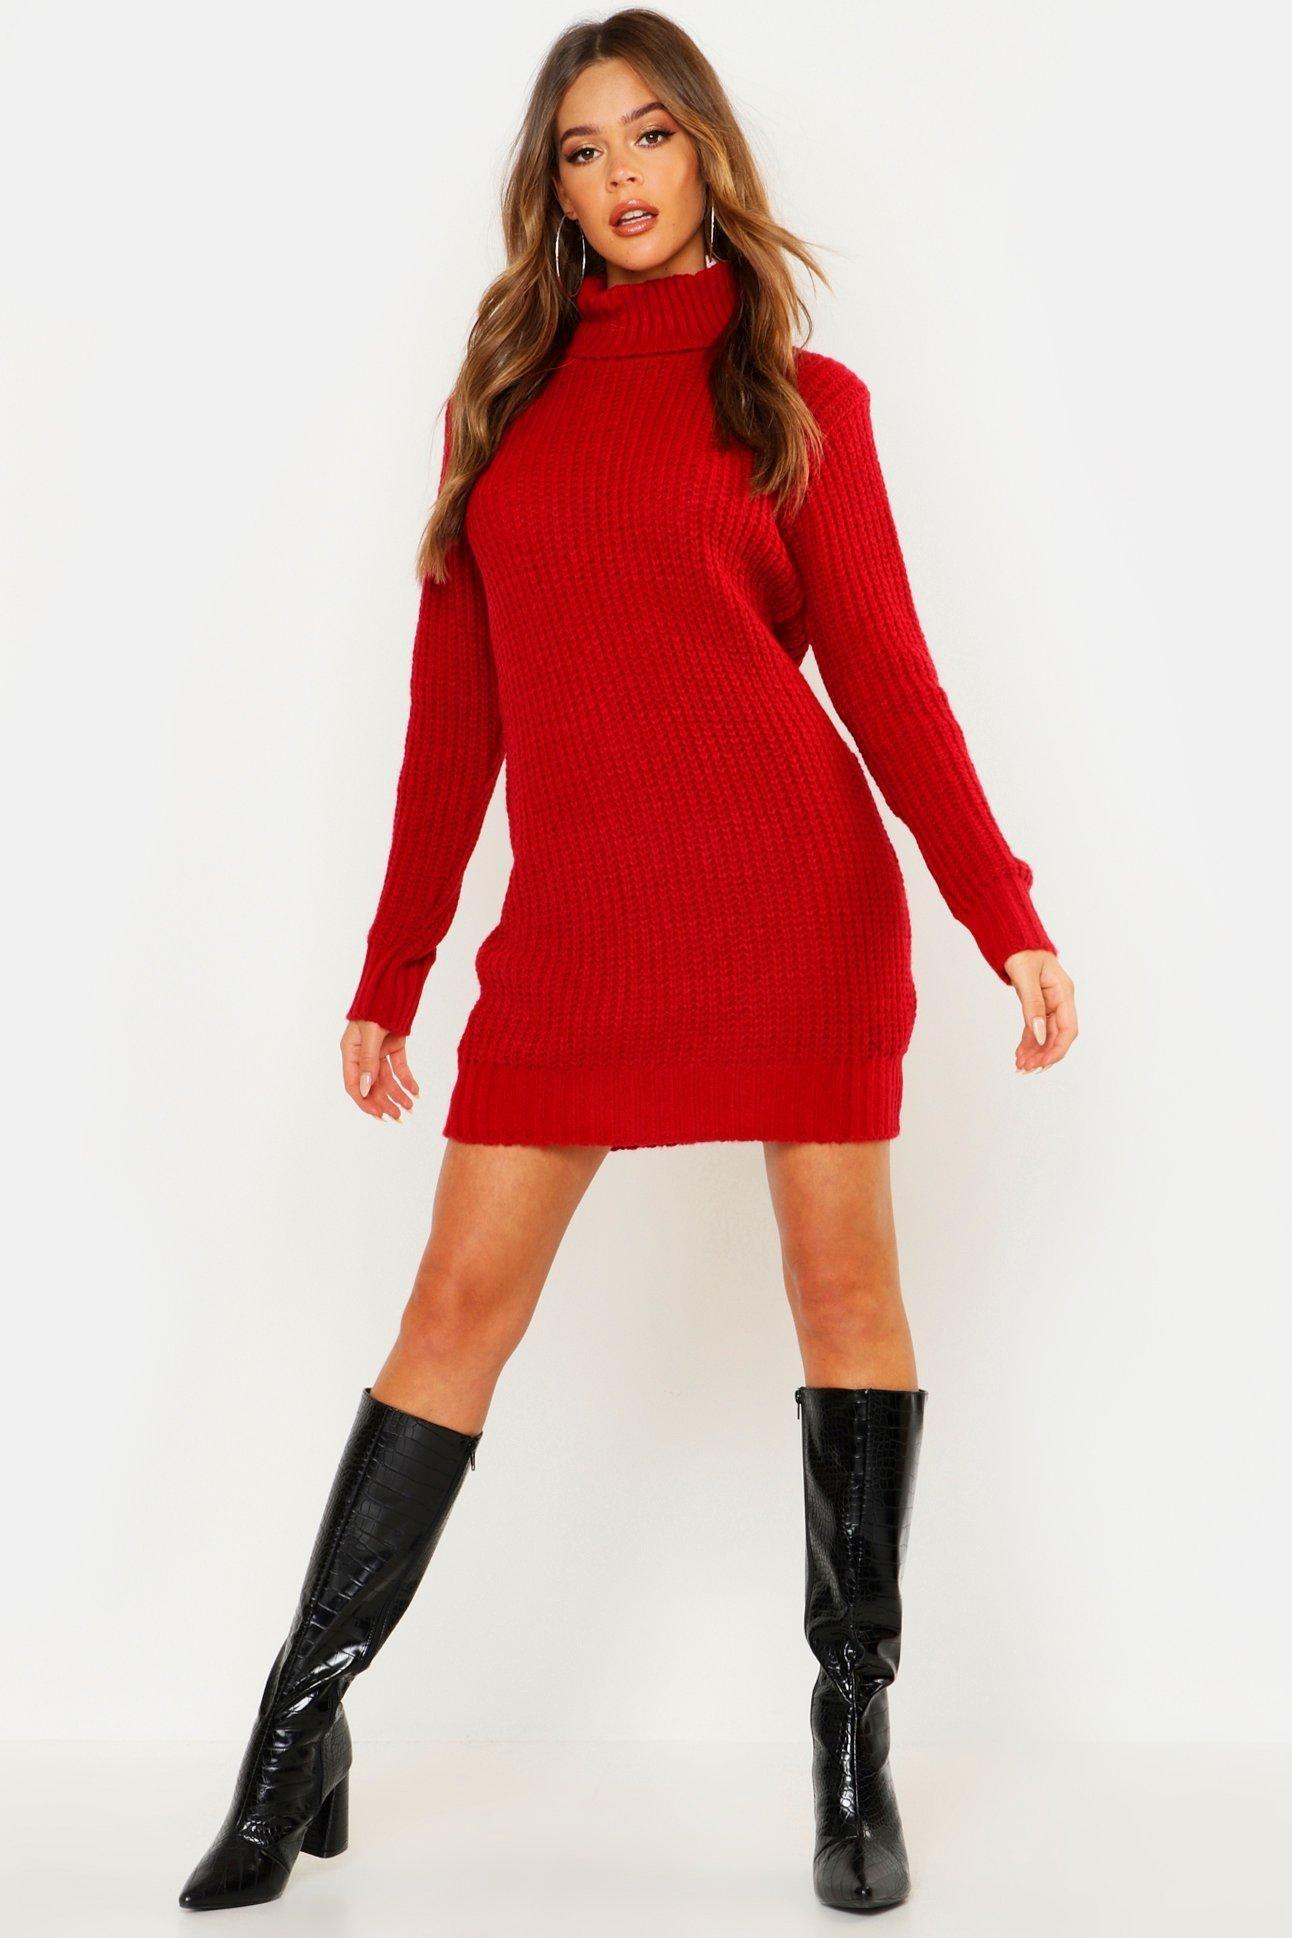 40++ Red sweater dress ideas in 2021